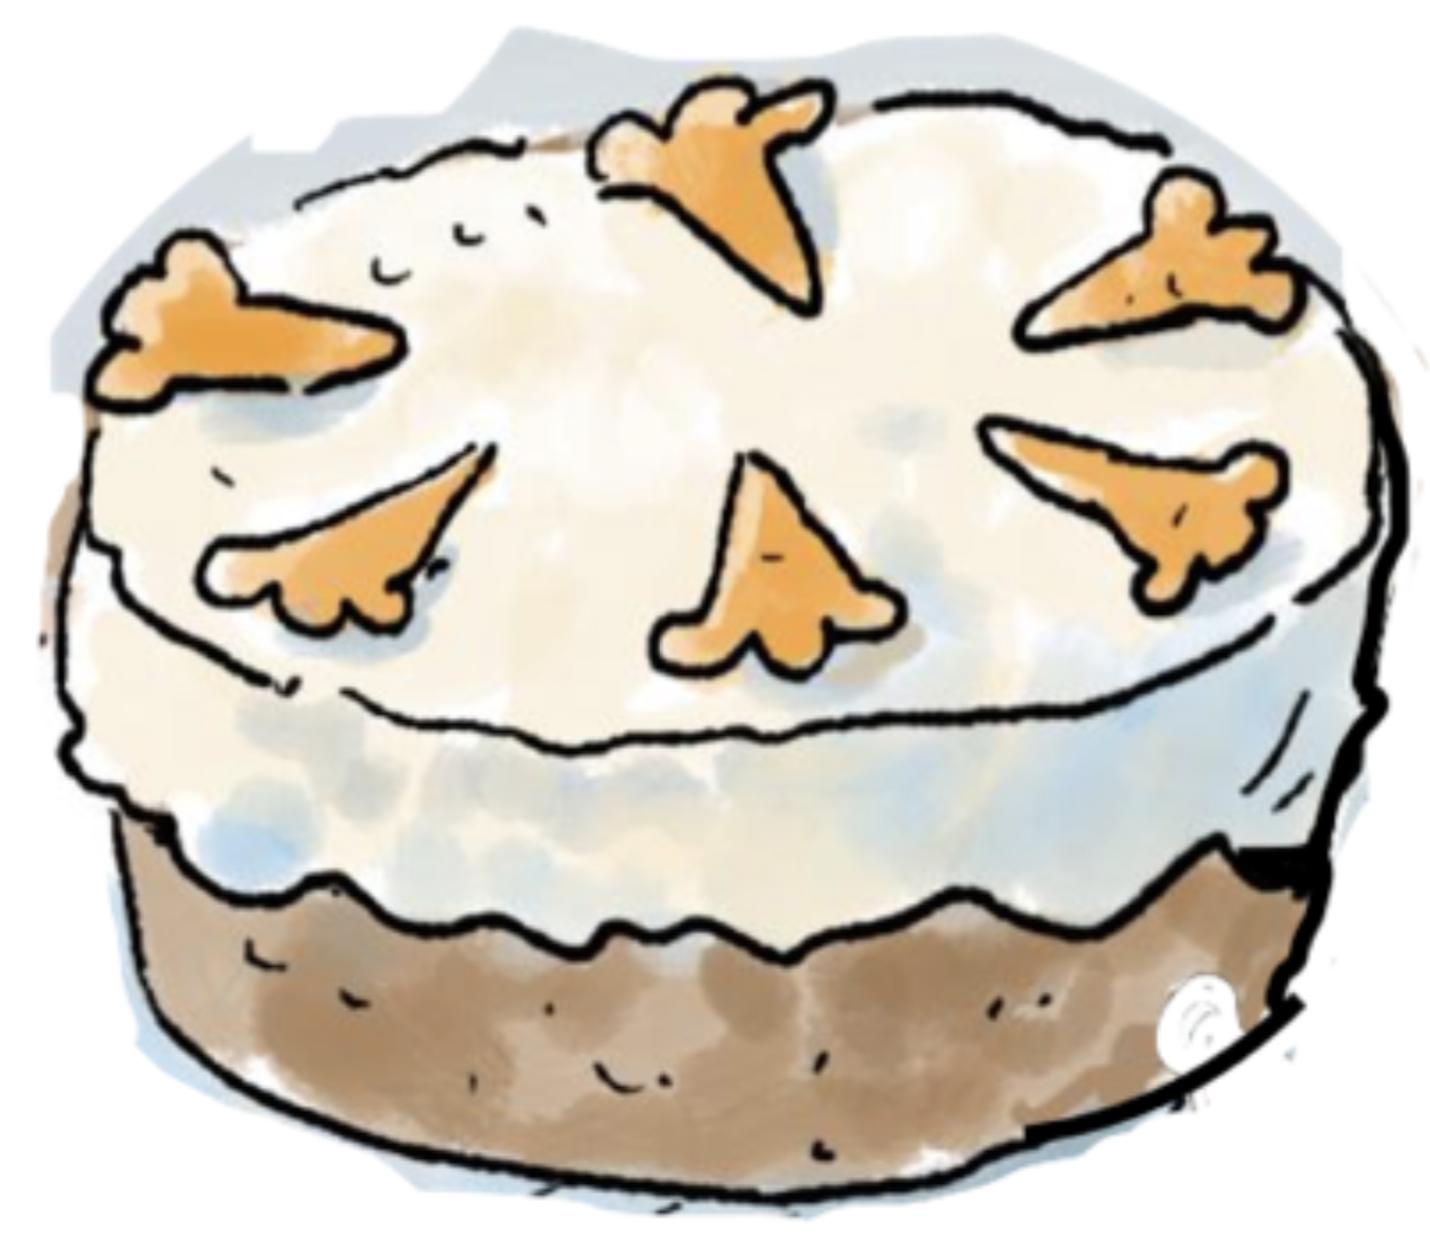 carrotcake.png